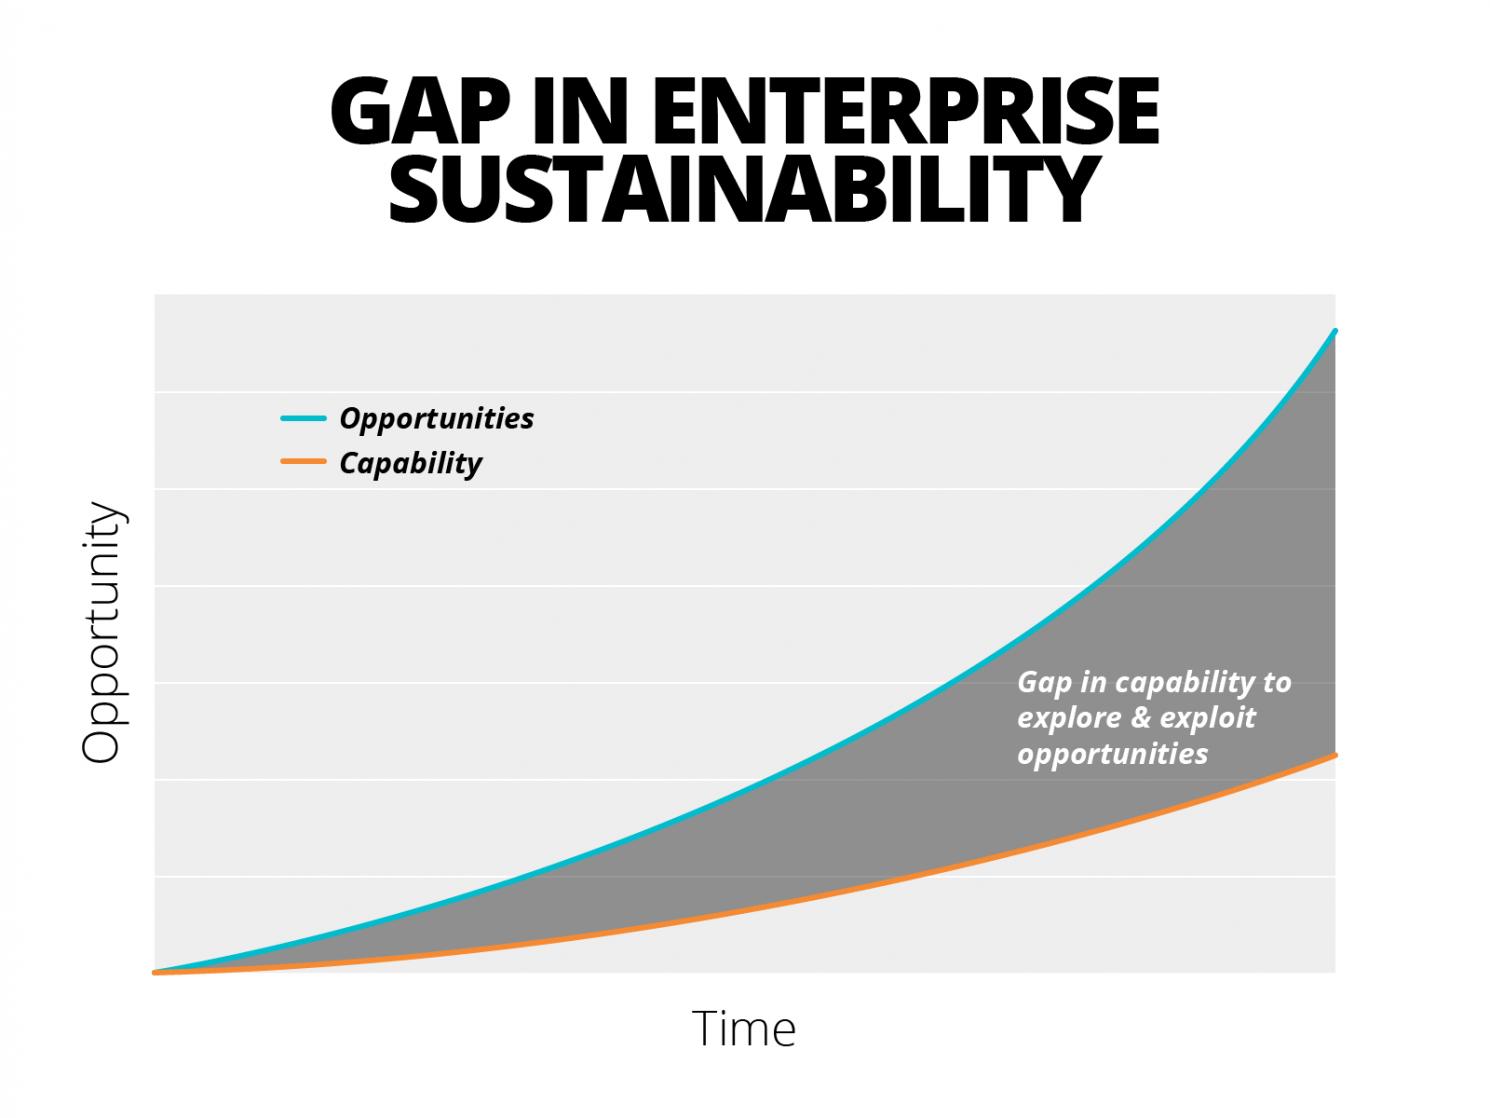 Gap in enterprise sustainability